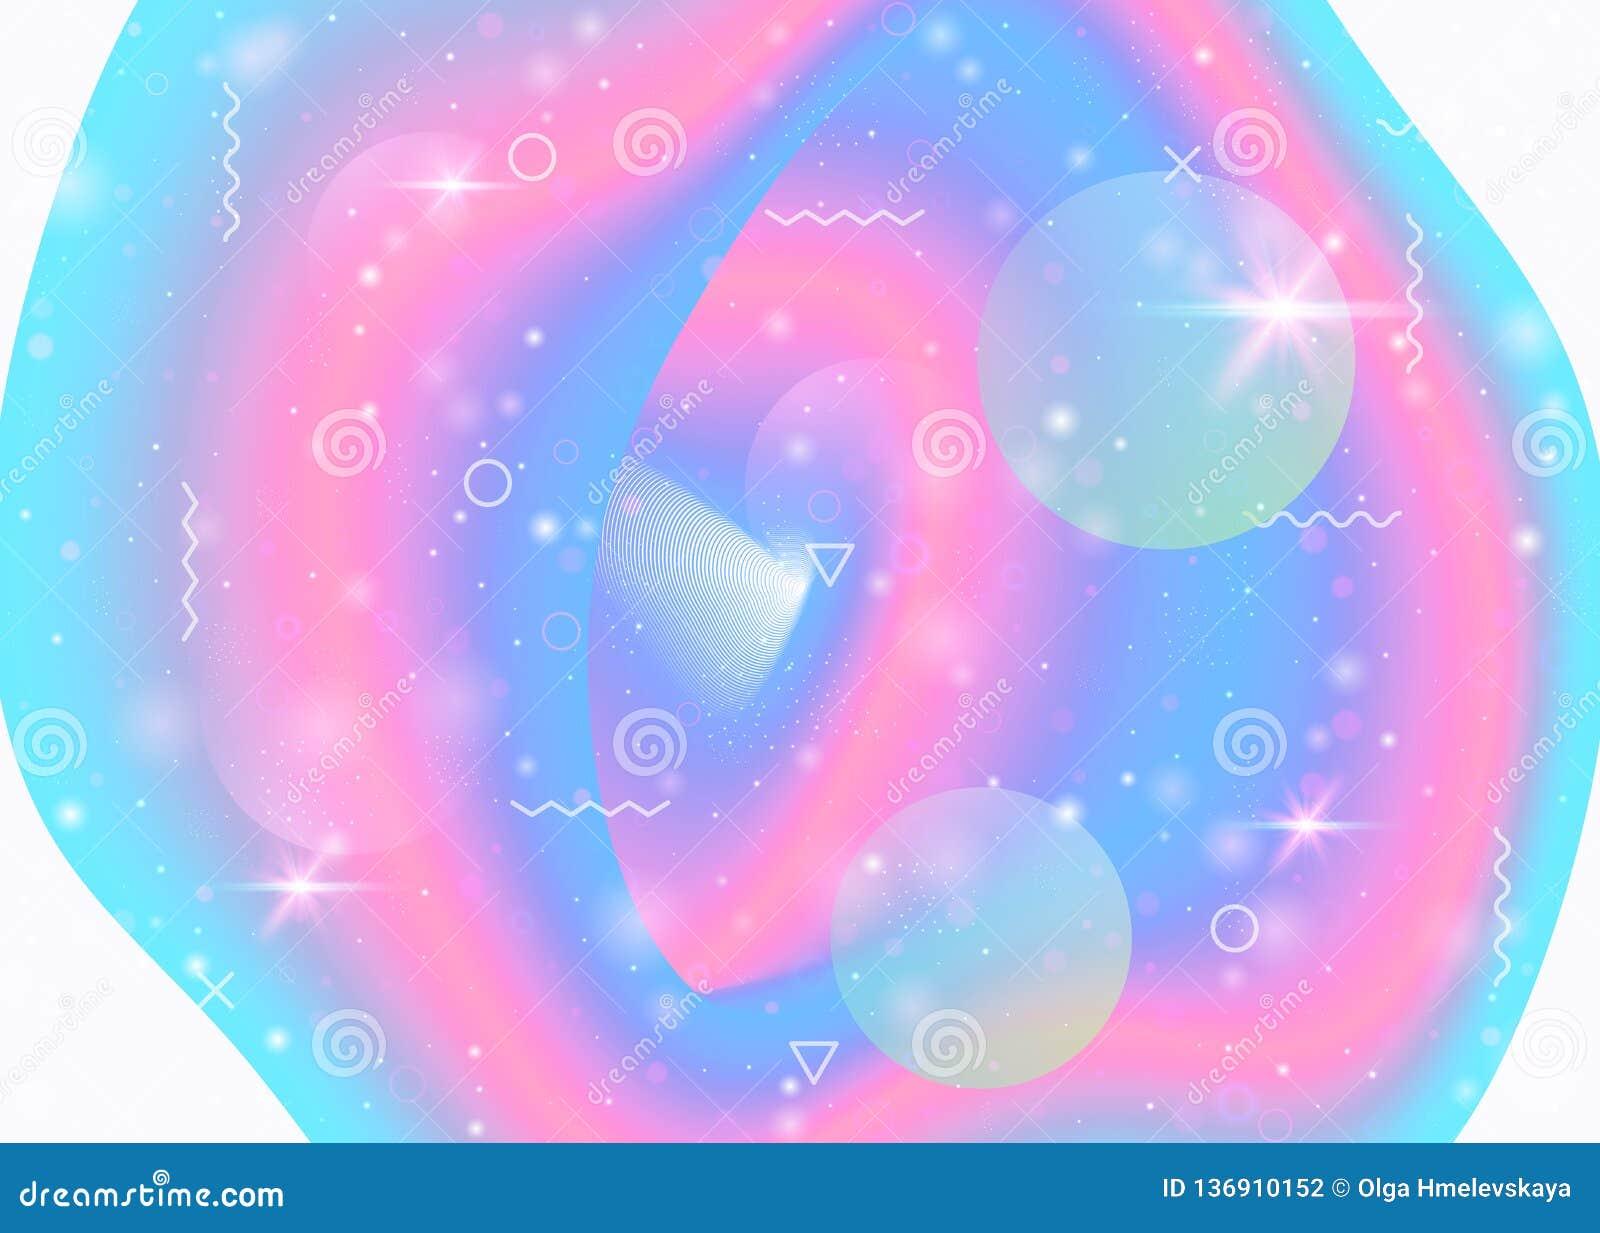 unicorn background kawaii magic gradient princess rainbow hologram fluorescent universe banner cute colors holographic 136910152